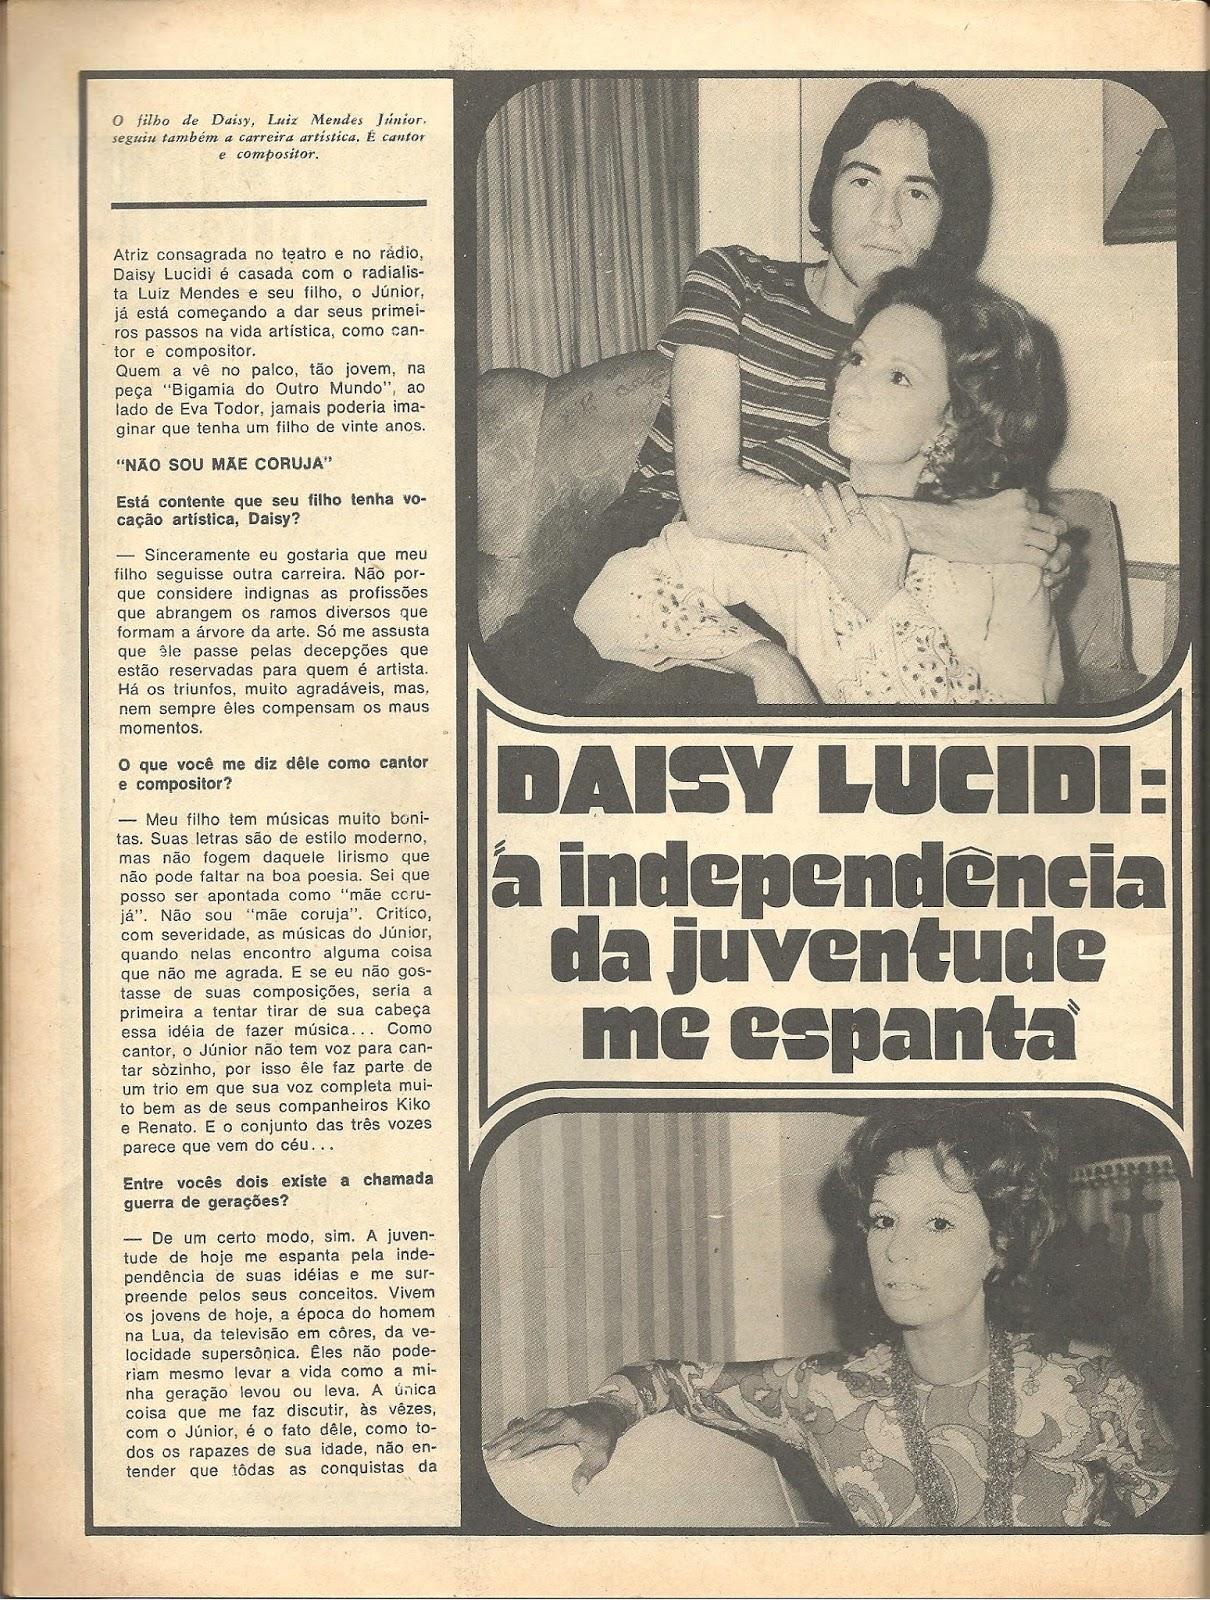 Dayse Lucidi Ele tudo isso é tv: romÂntica nº 128 - dezembro 1971